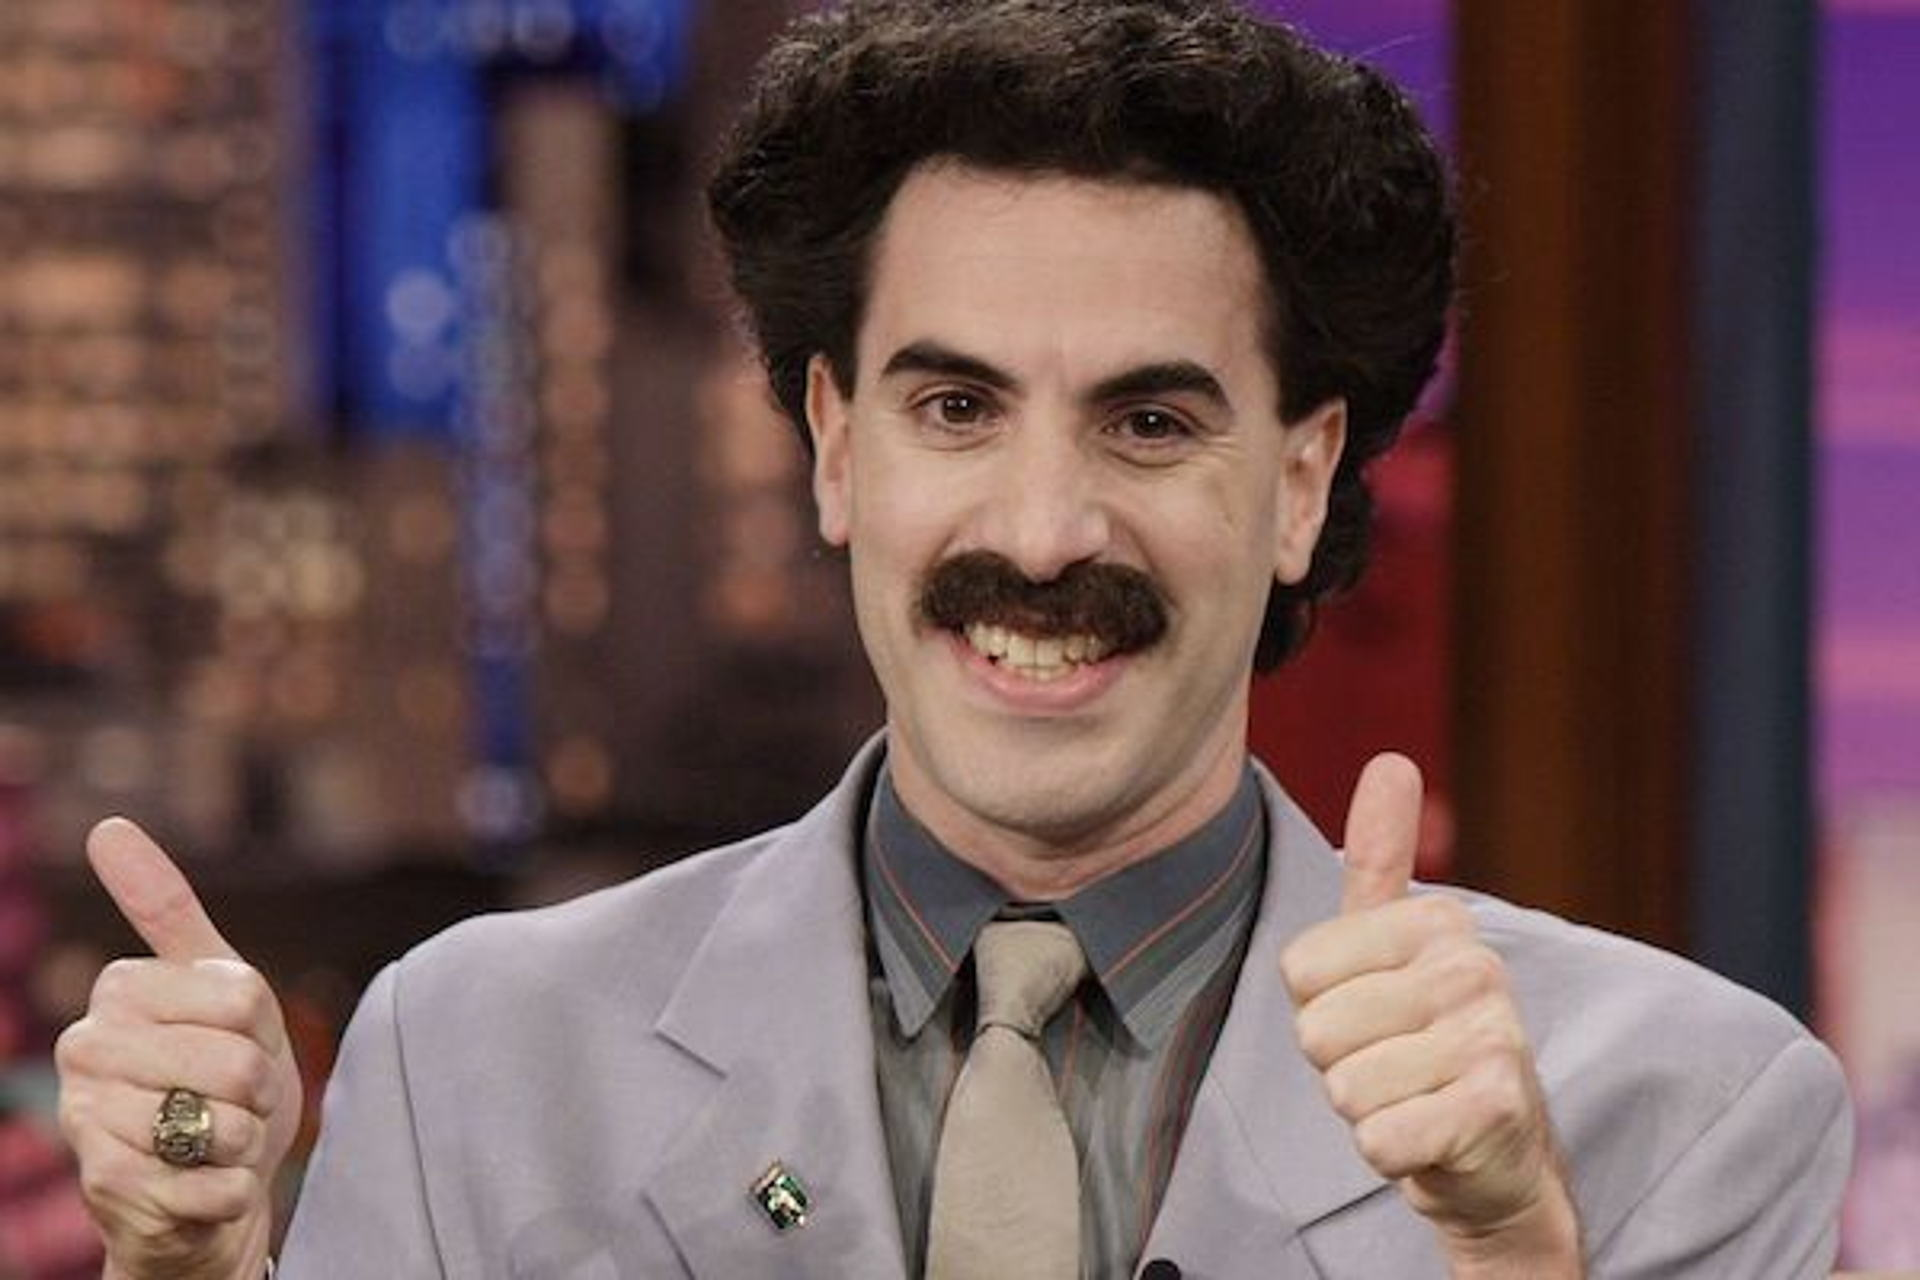 Borat turns 50 today! Great success! Happy Birthday Sacha Baron Cohen, GenX comedian and actor.